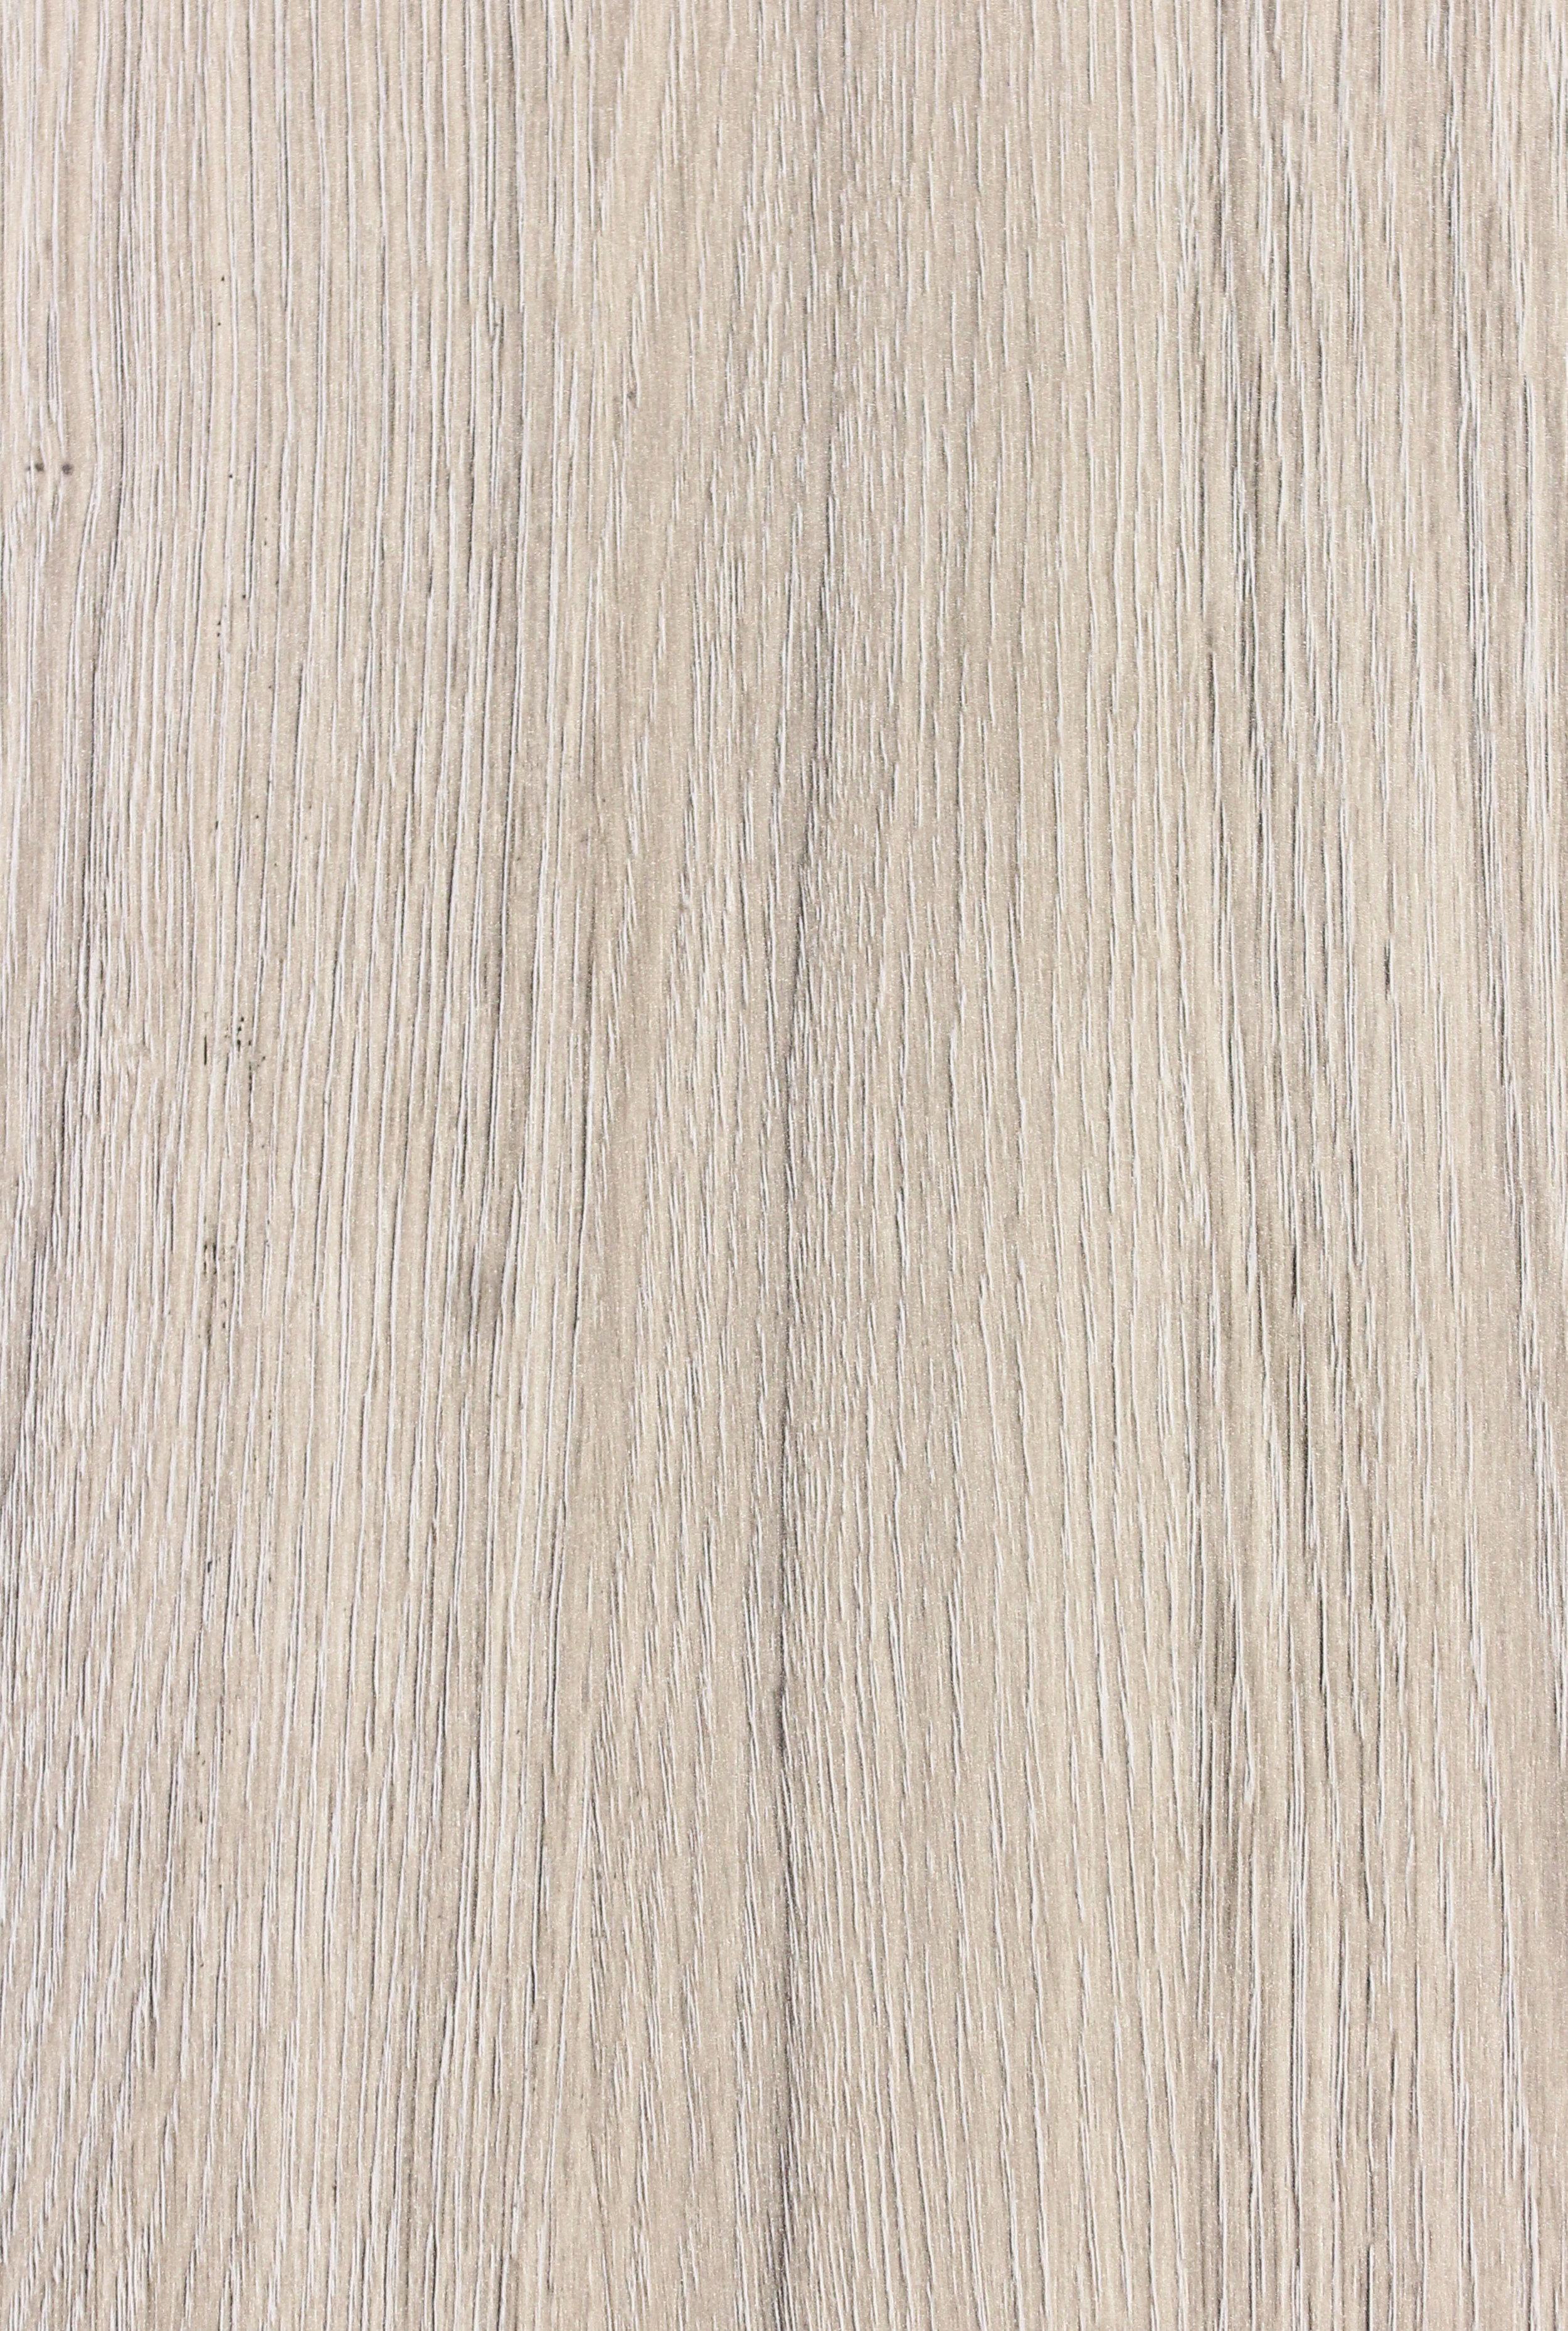 Oyster Urban oak